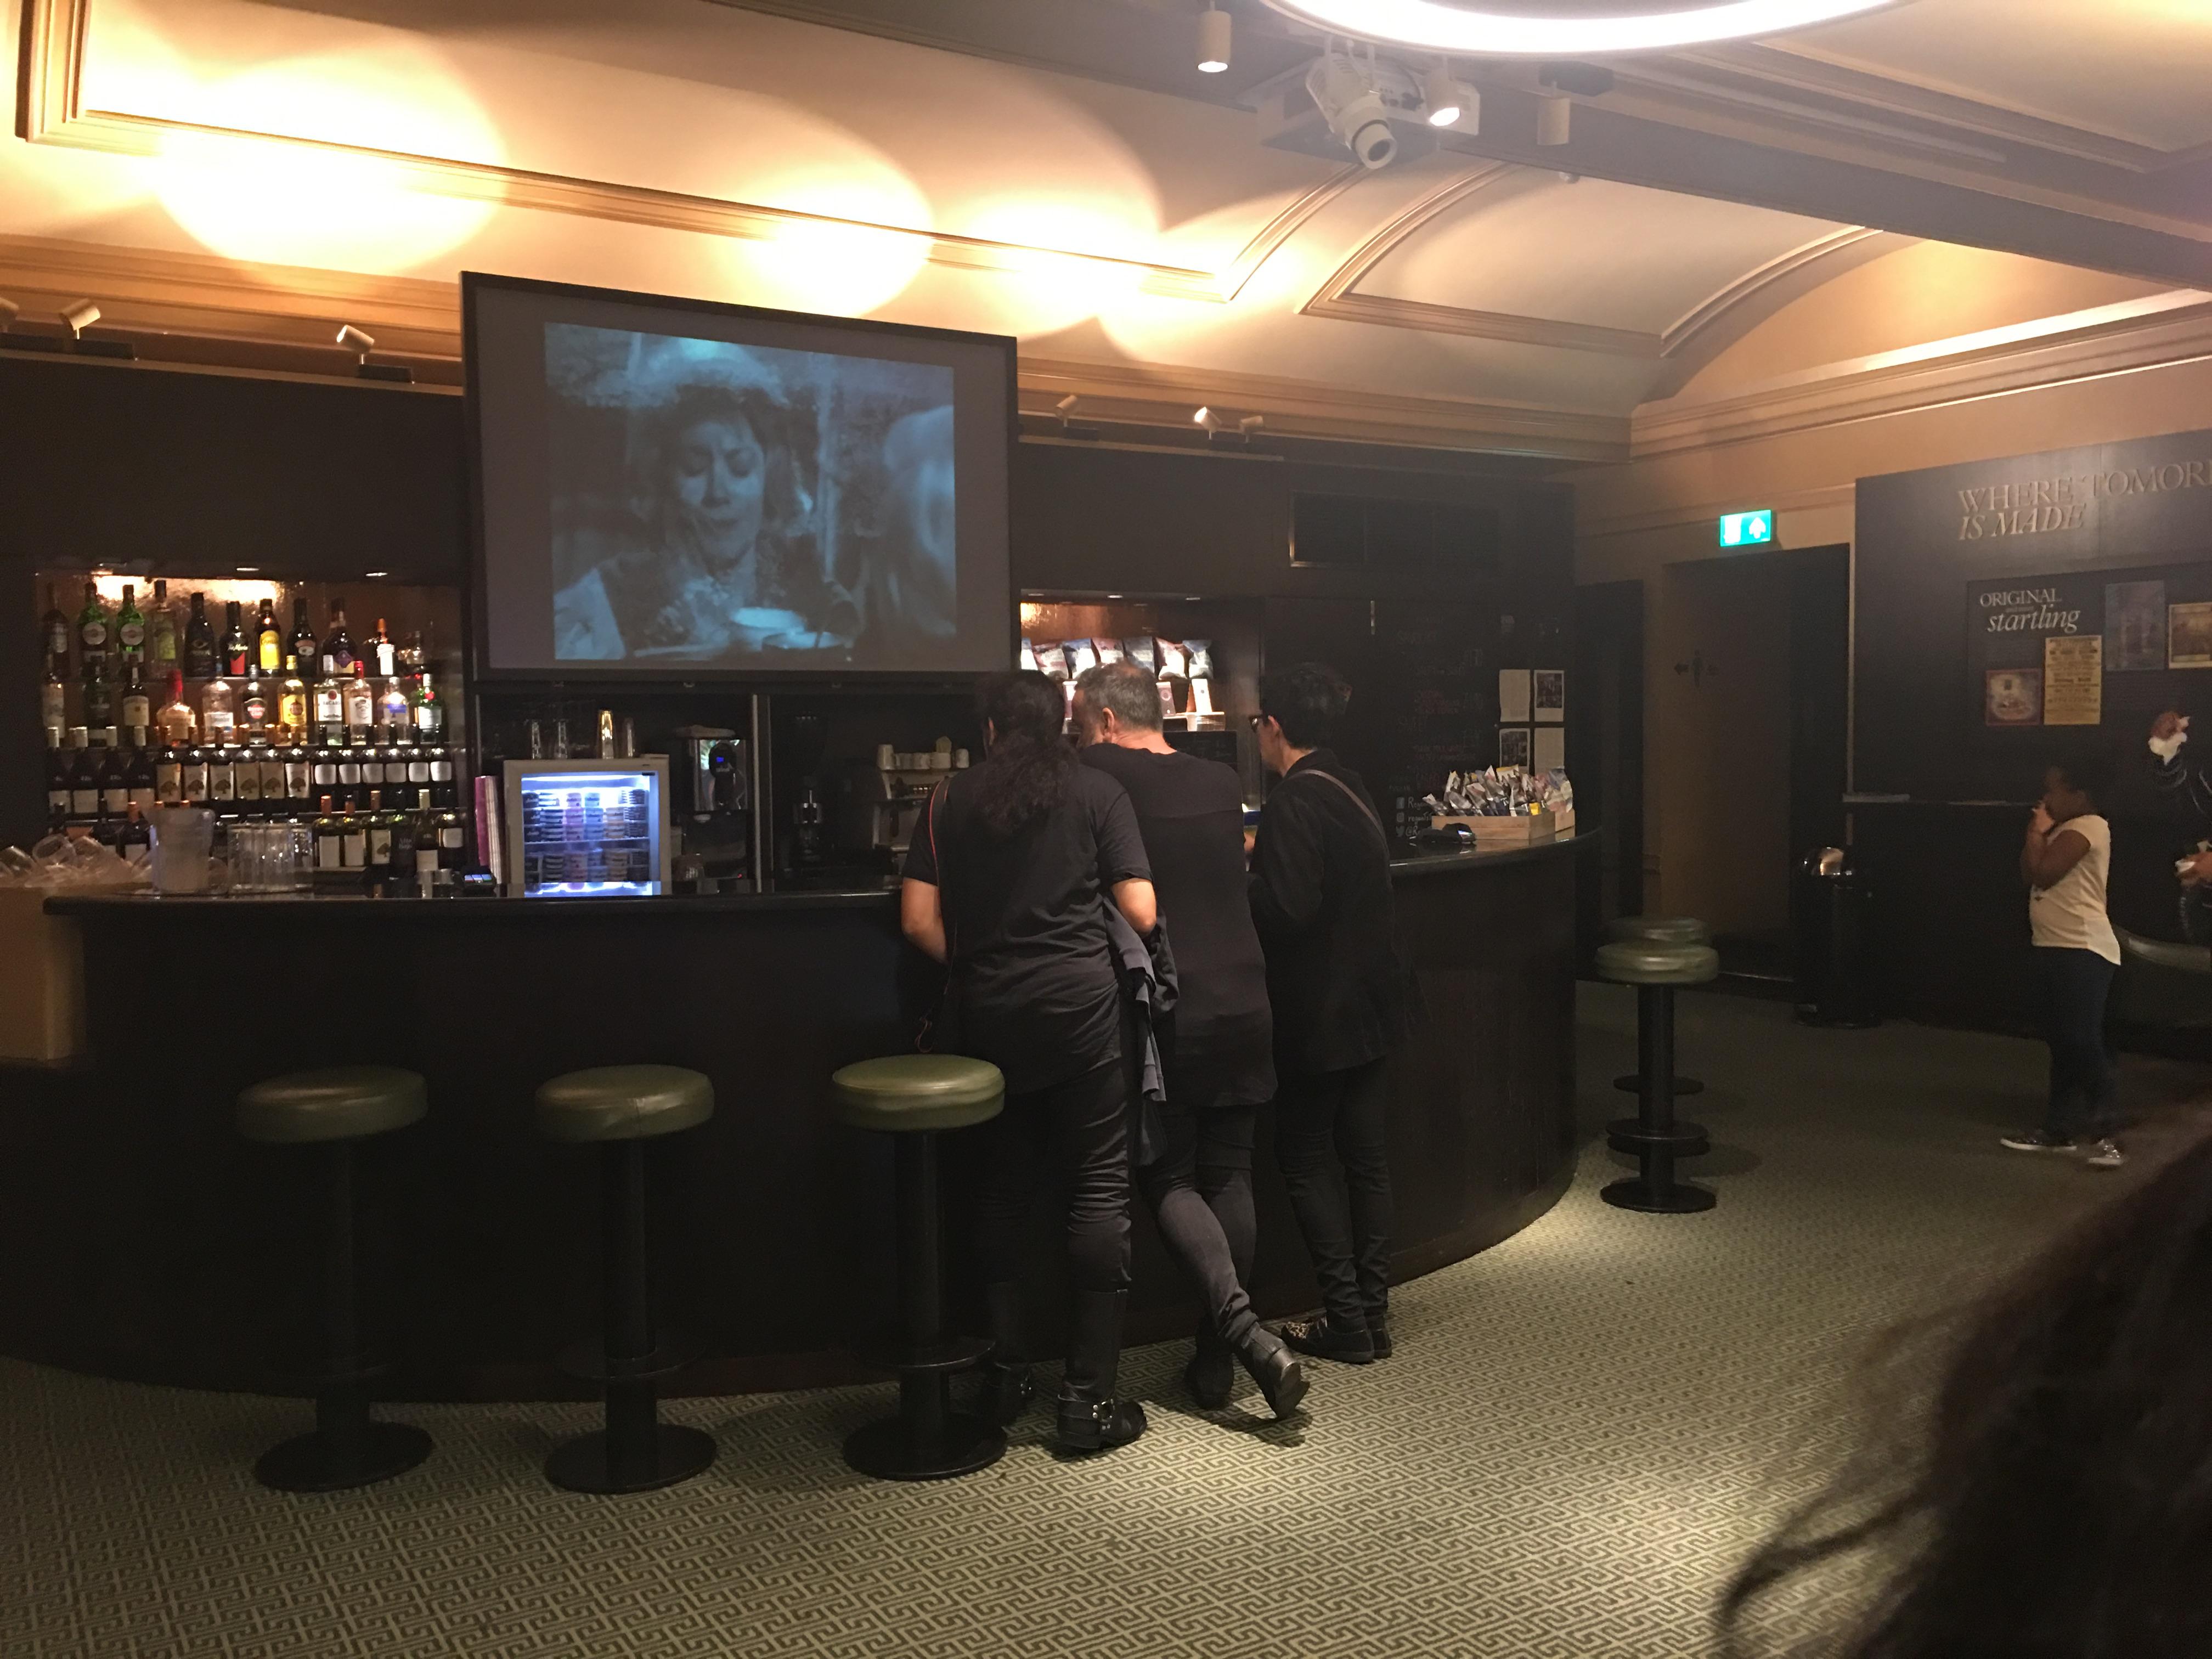 film playing at the cinema bar